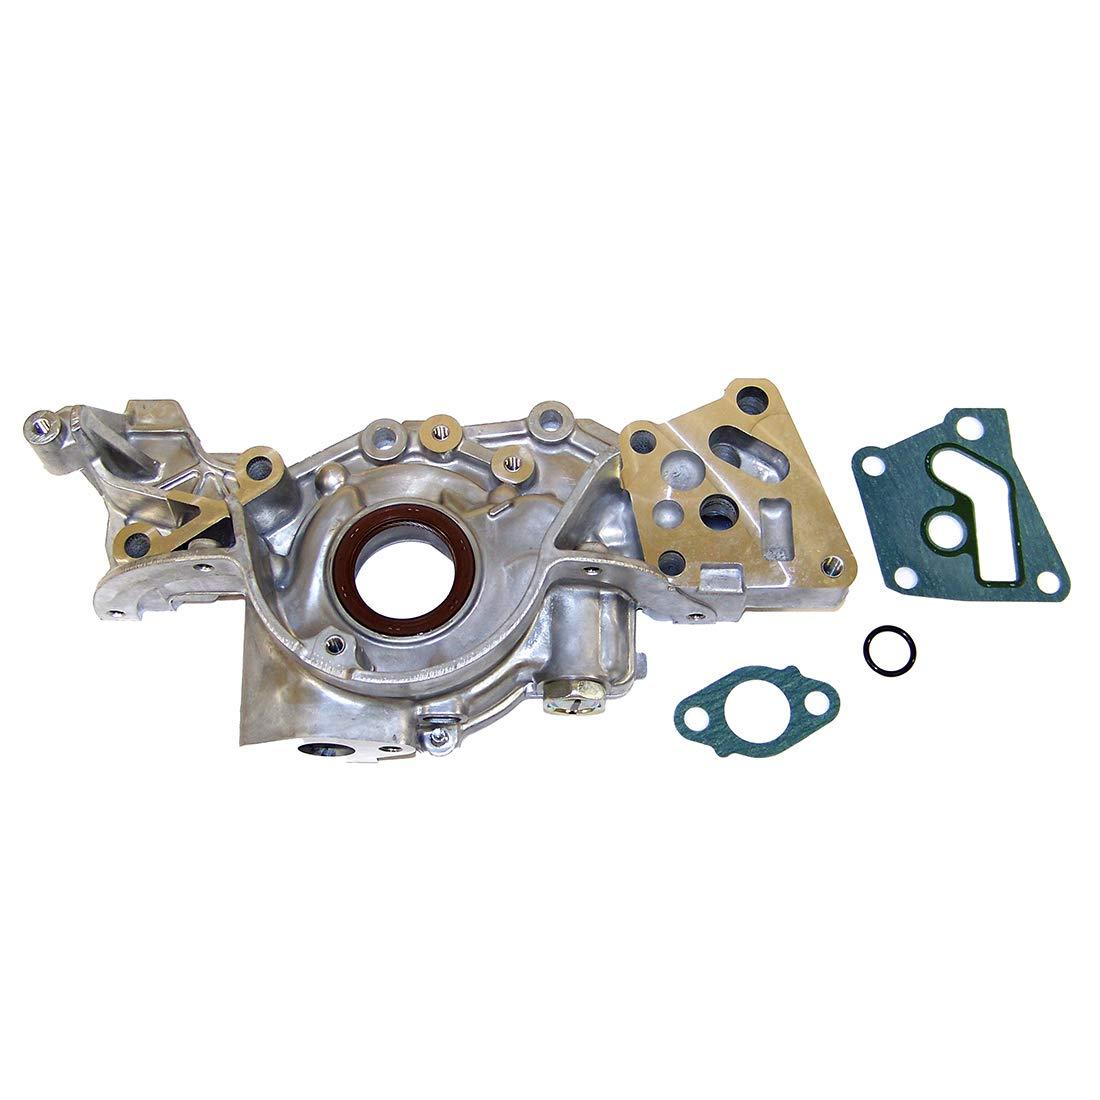 DNJ Engine Components OIL PUMPS OP163